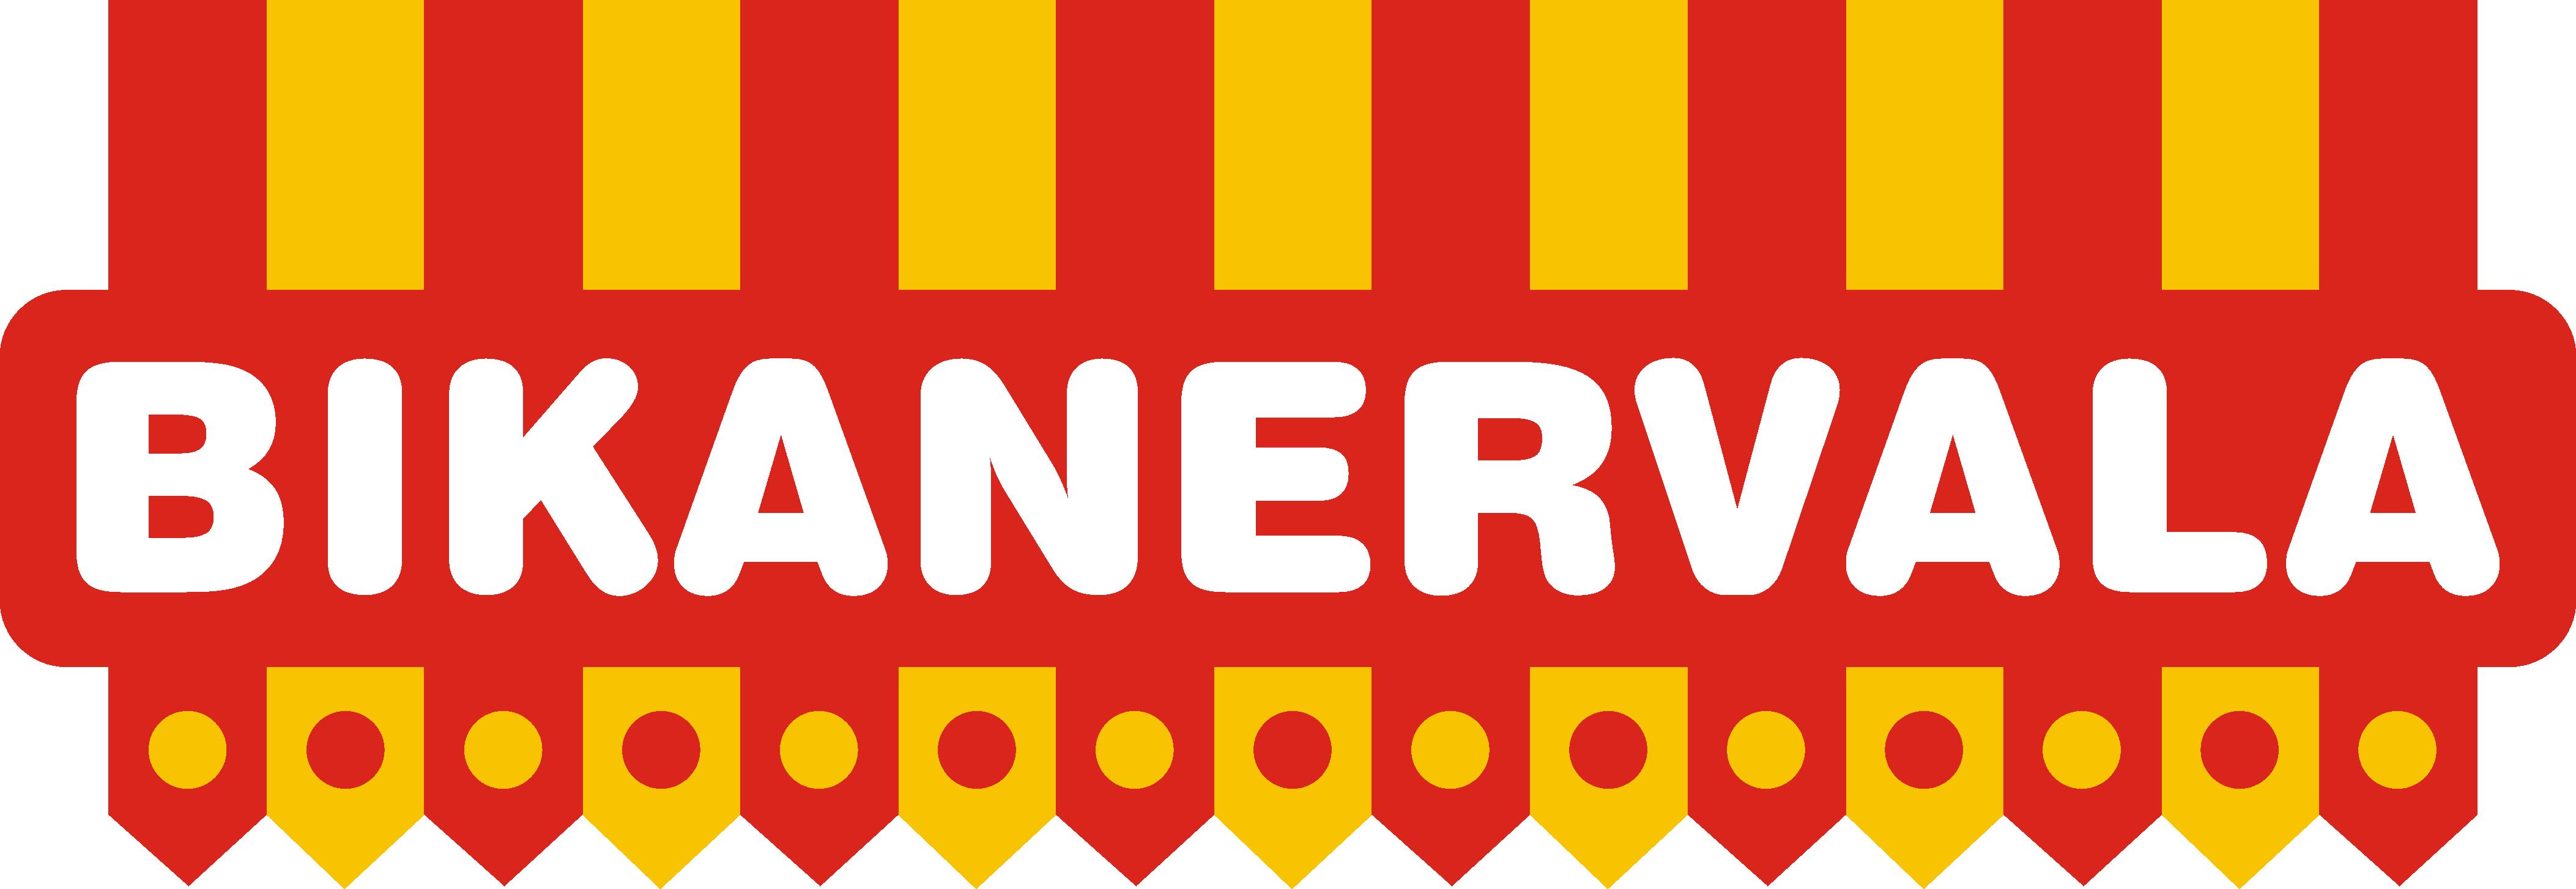 Bikanervalaのロゴ